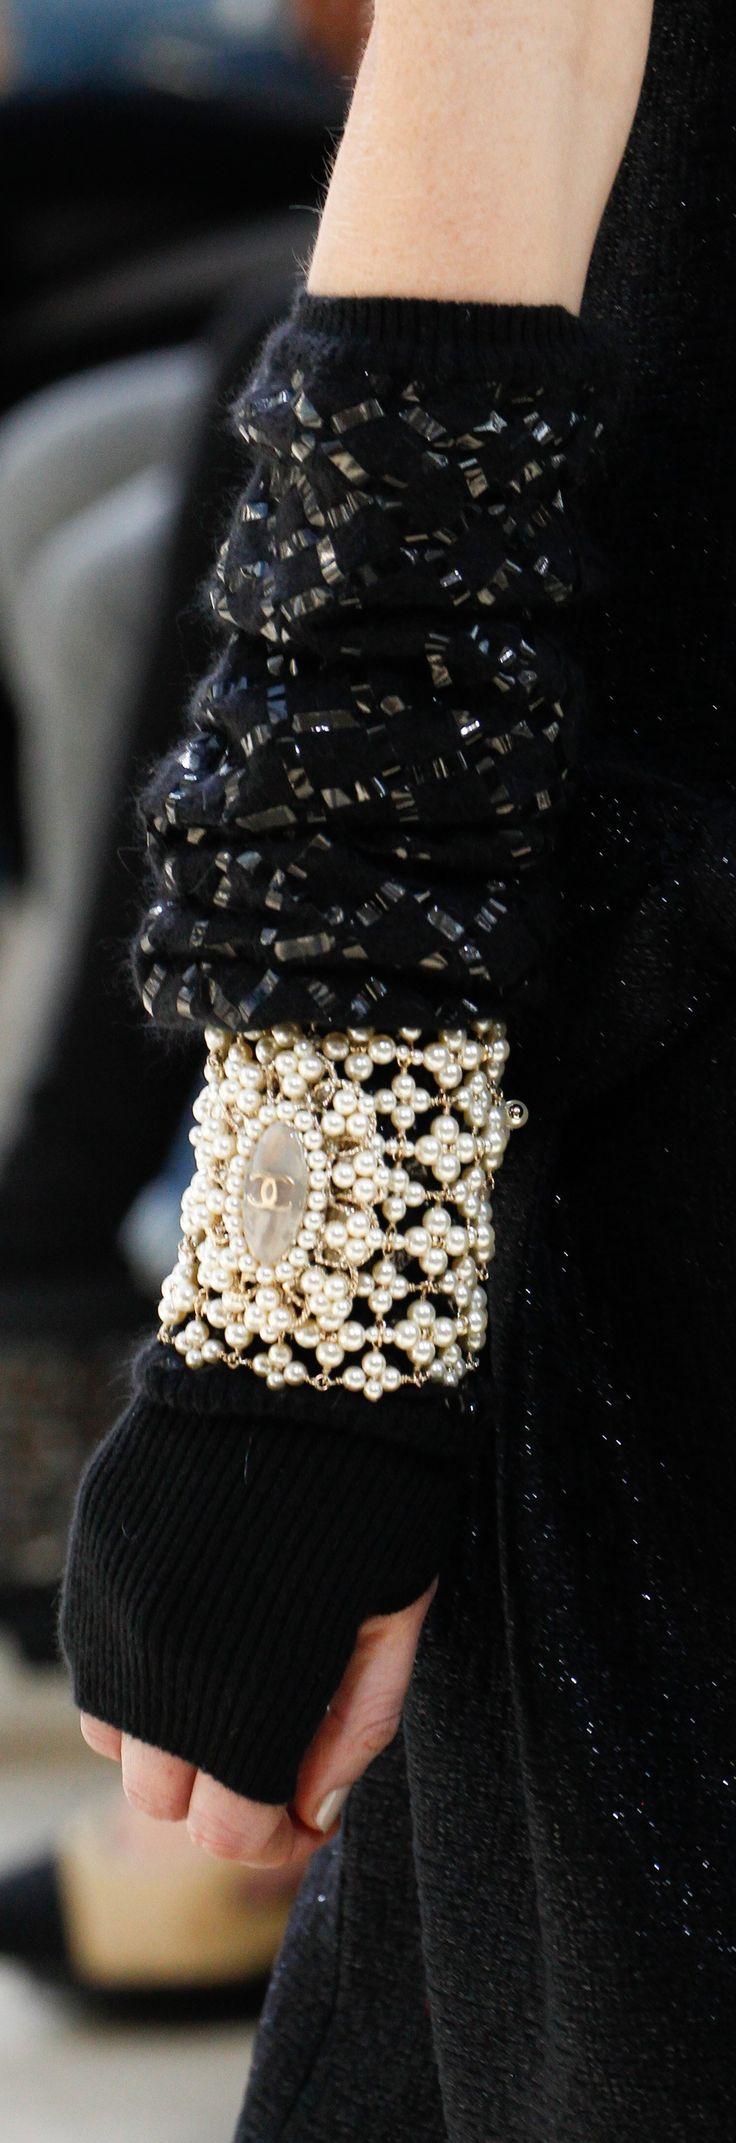 Fall 2016 Ready-to-Wear Chanel